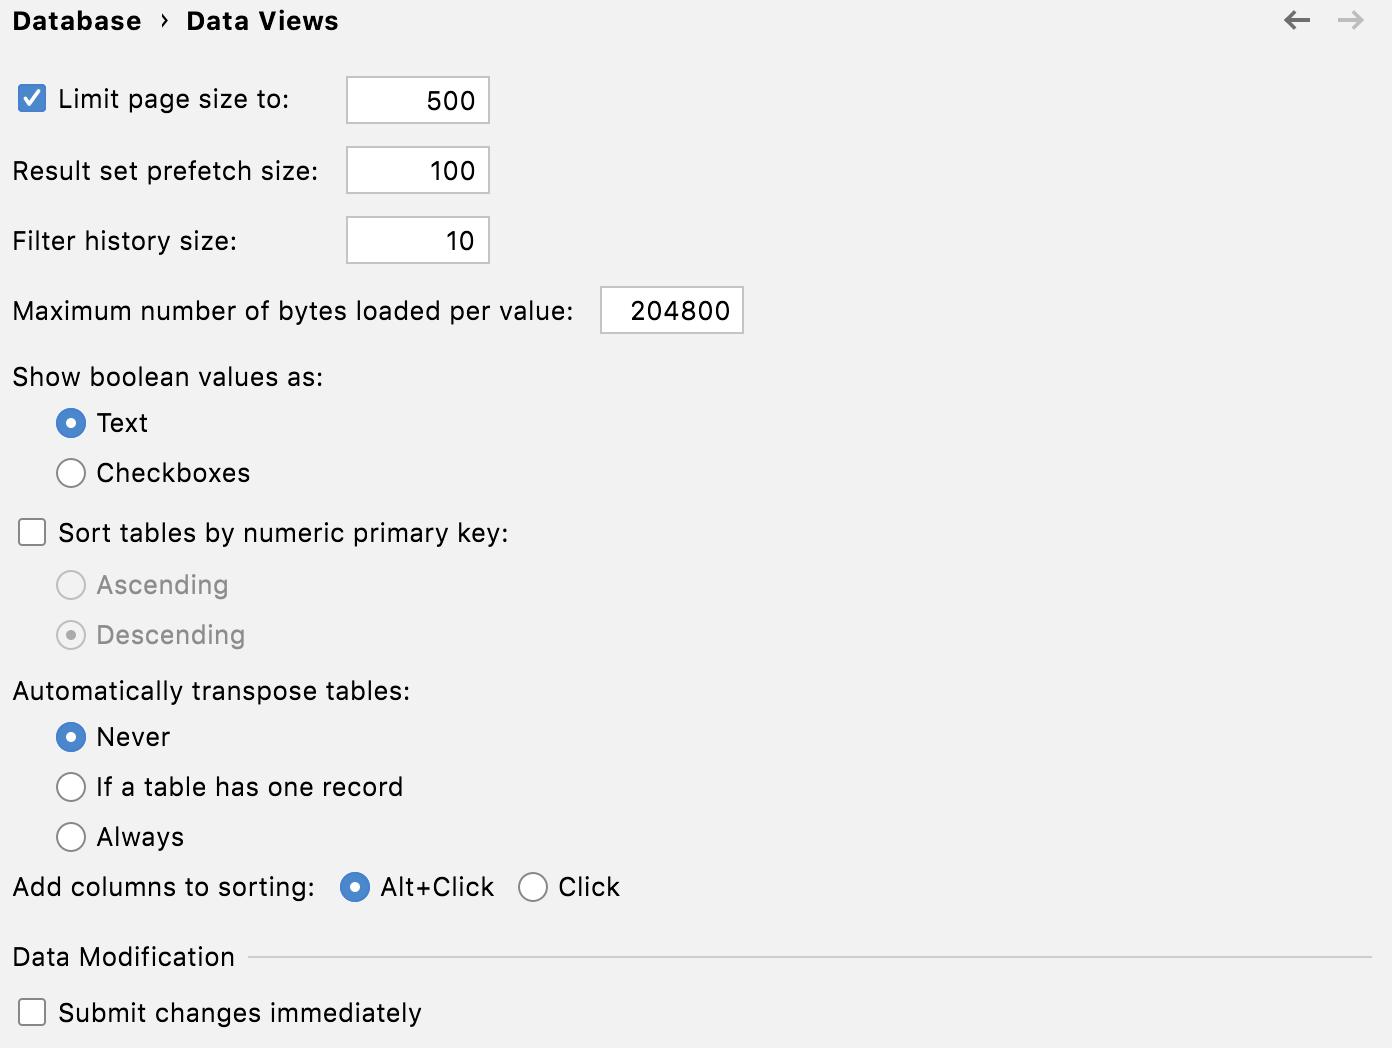 The Data Views menu of the Database settings